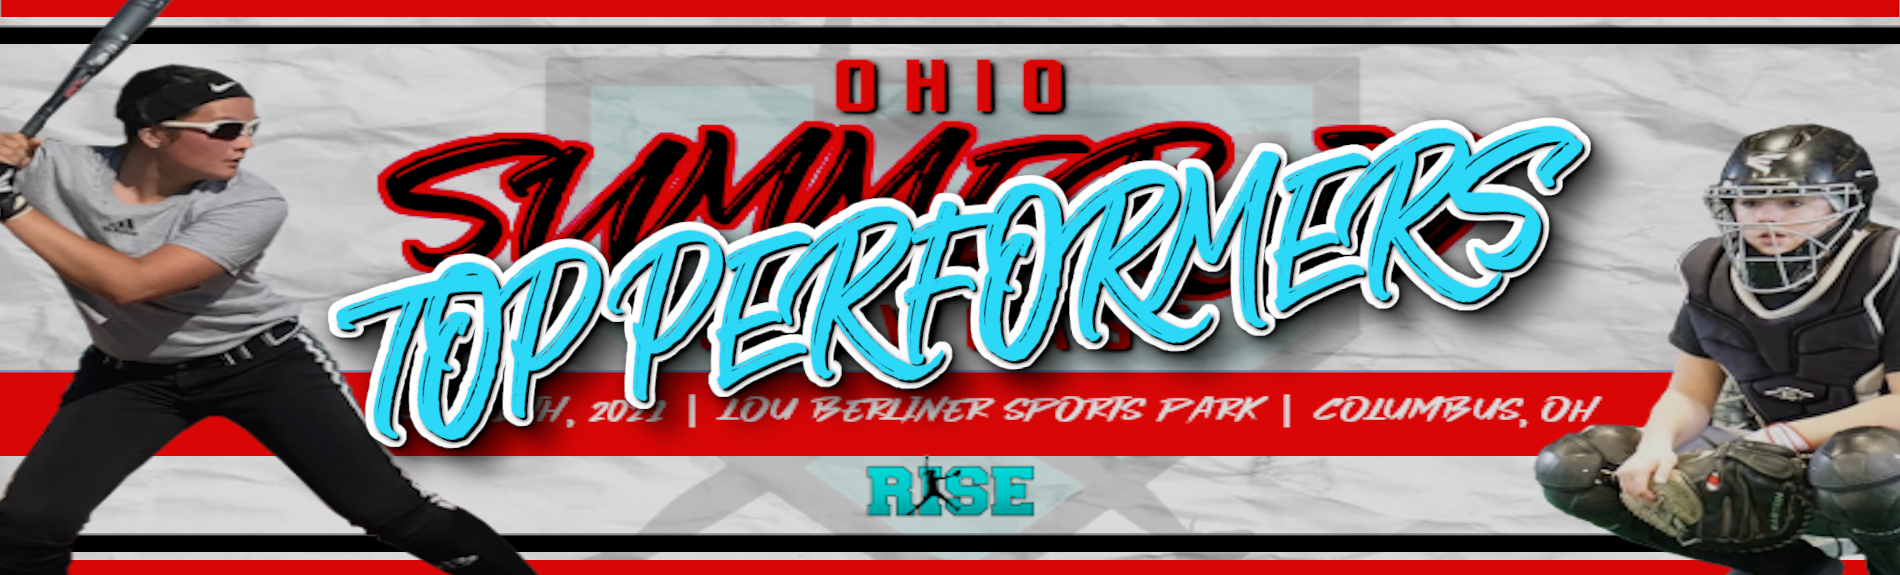 "Ohio Summer ID Showcase ""TOP PERFORMERS"""